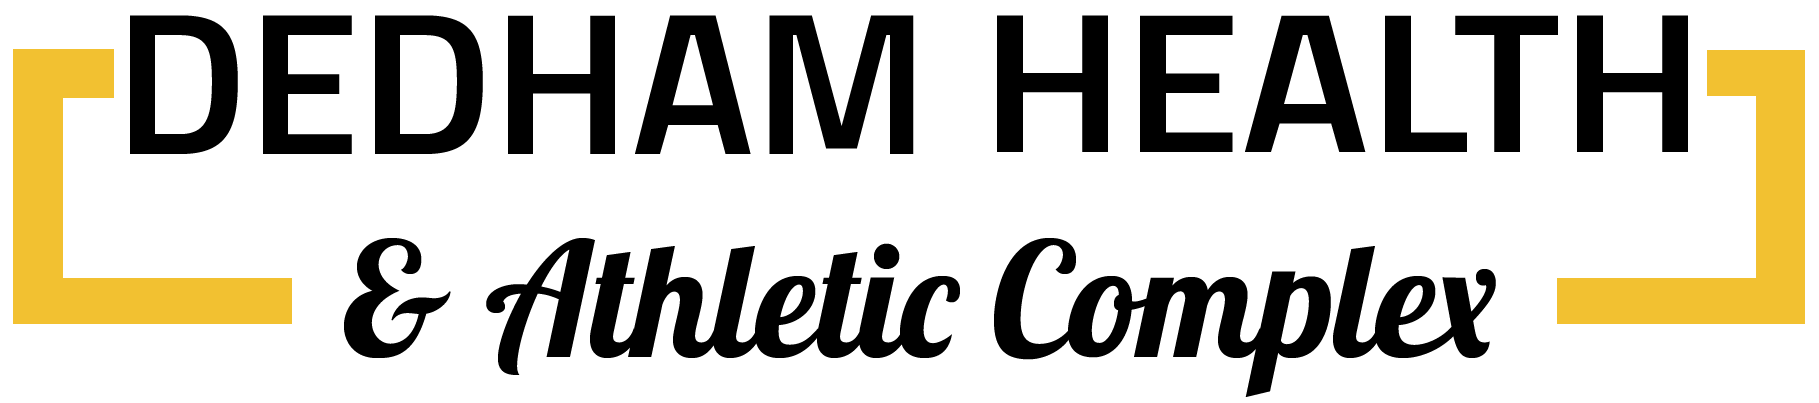 high-res-logo-black